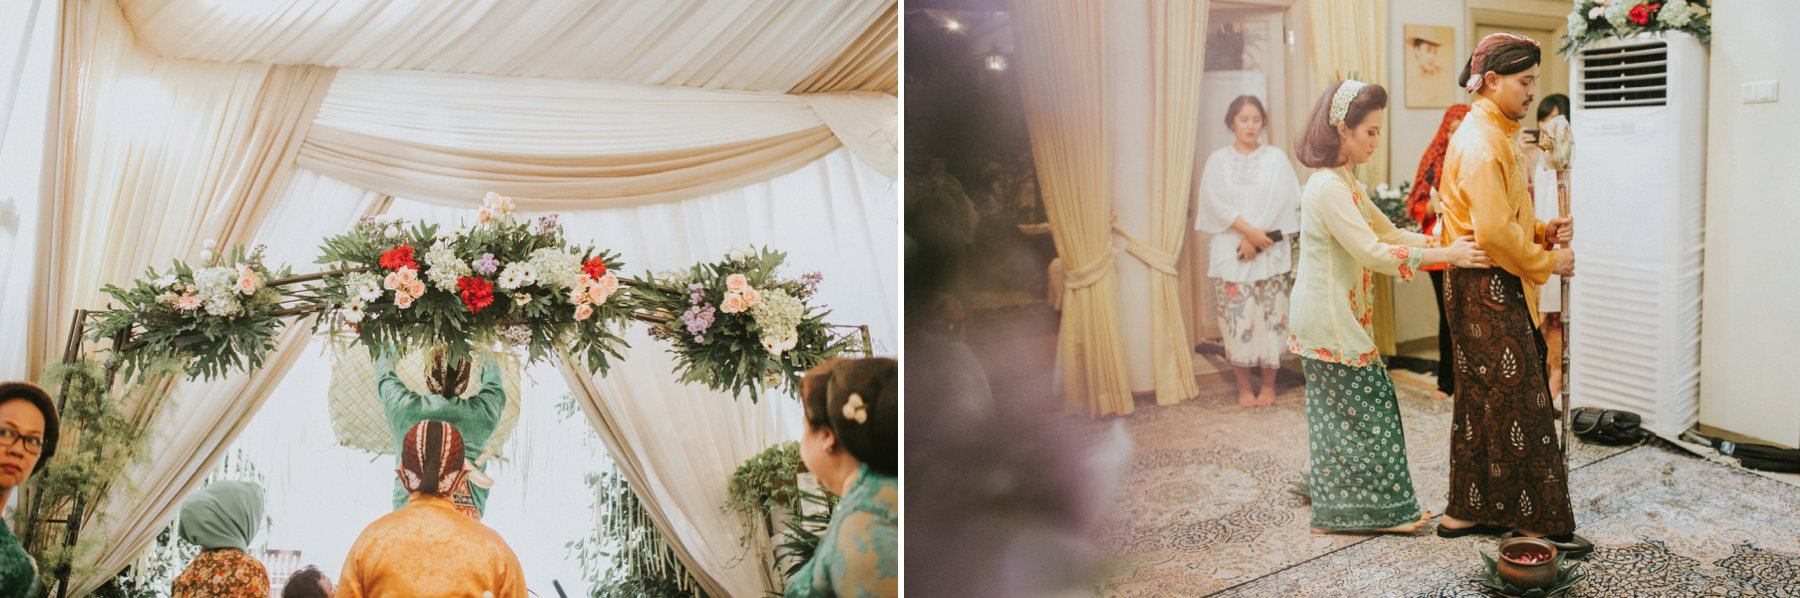 Sampoerna_Strategic_Wedding_Antijitters_Photo_0008